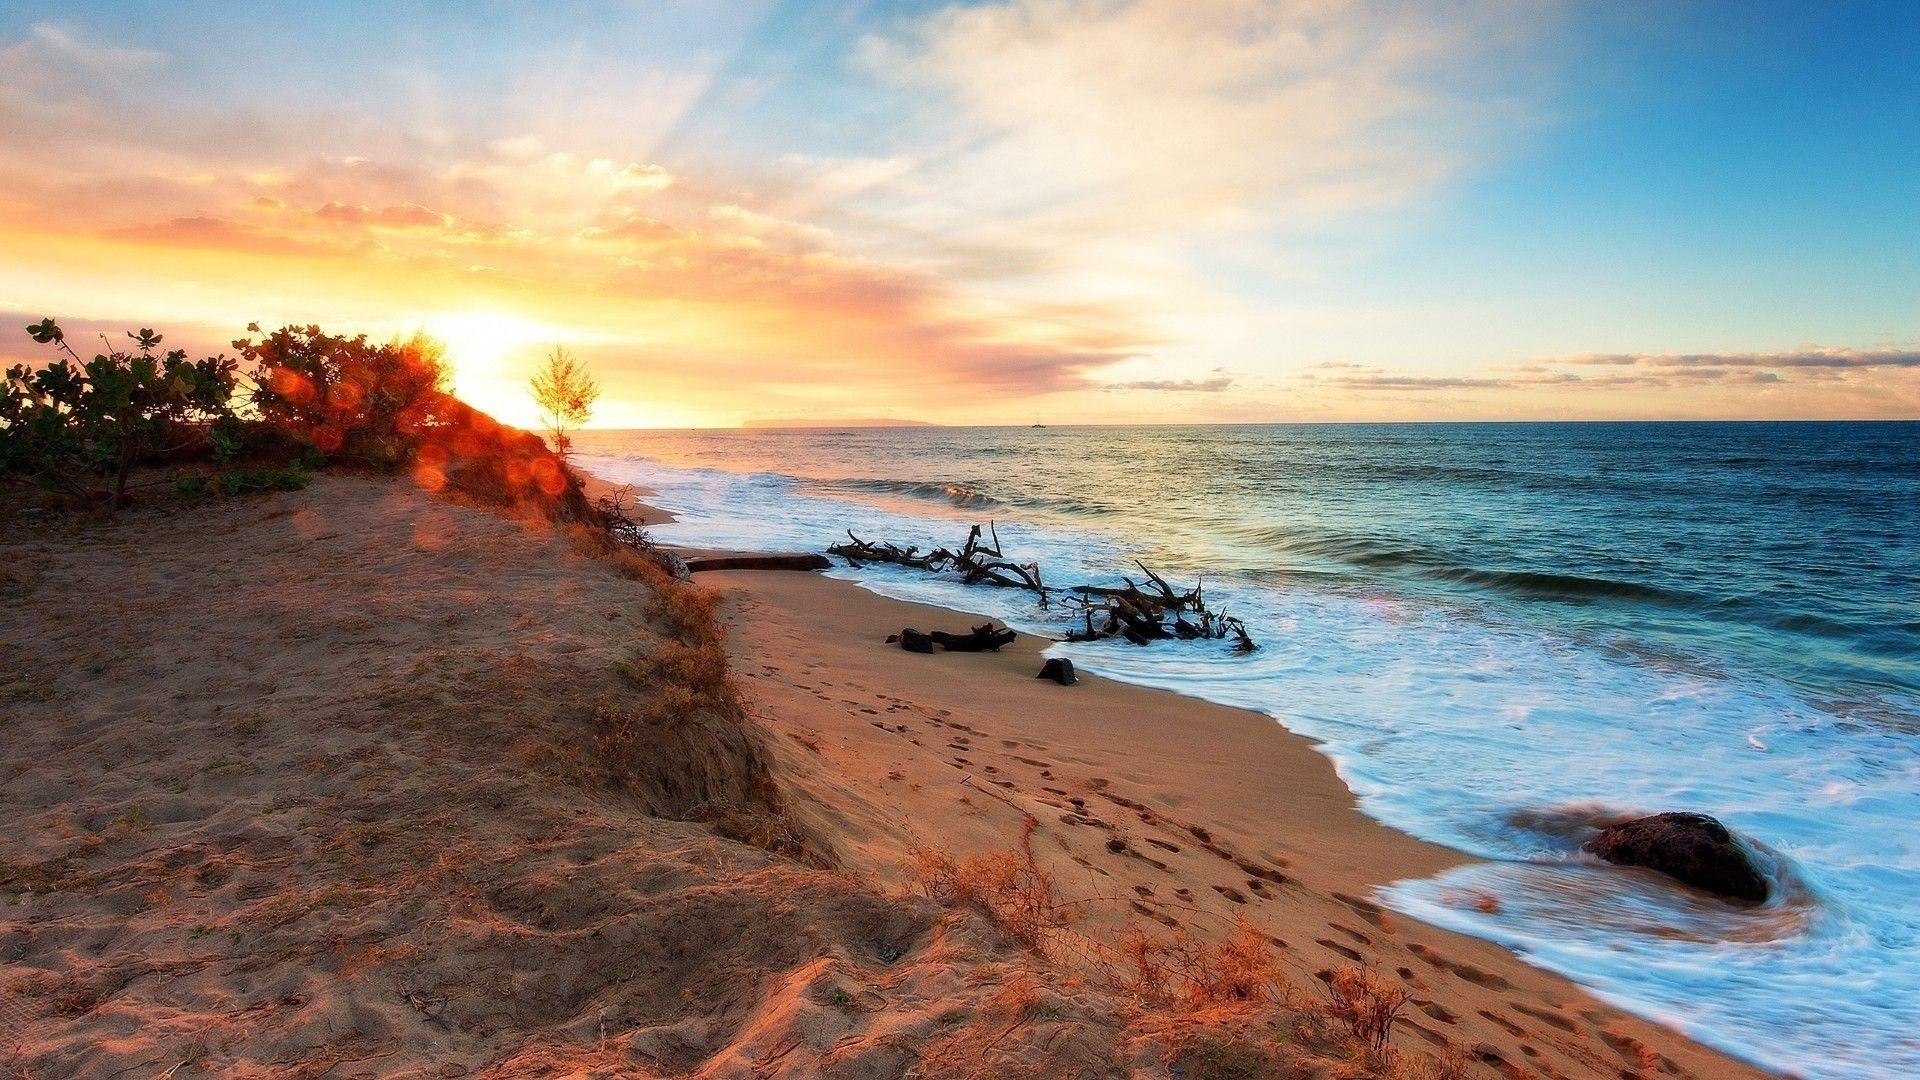 Ocean Sunset download wallpaper image